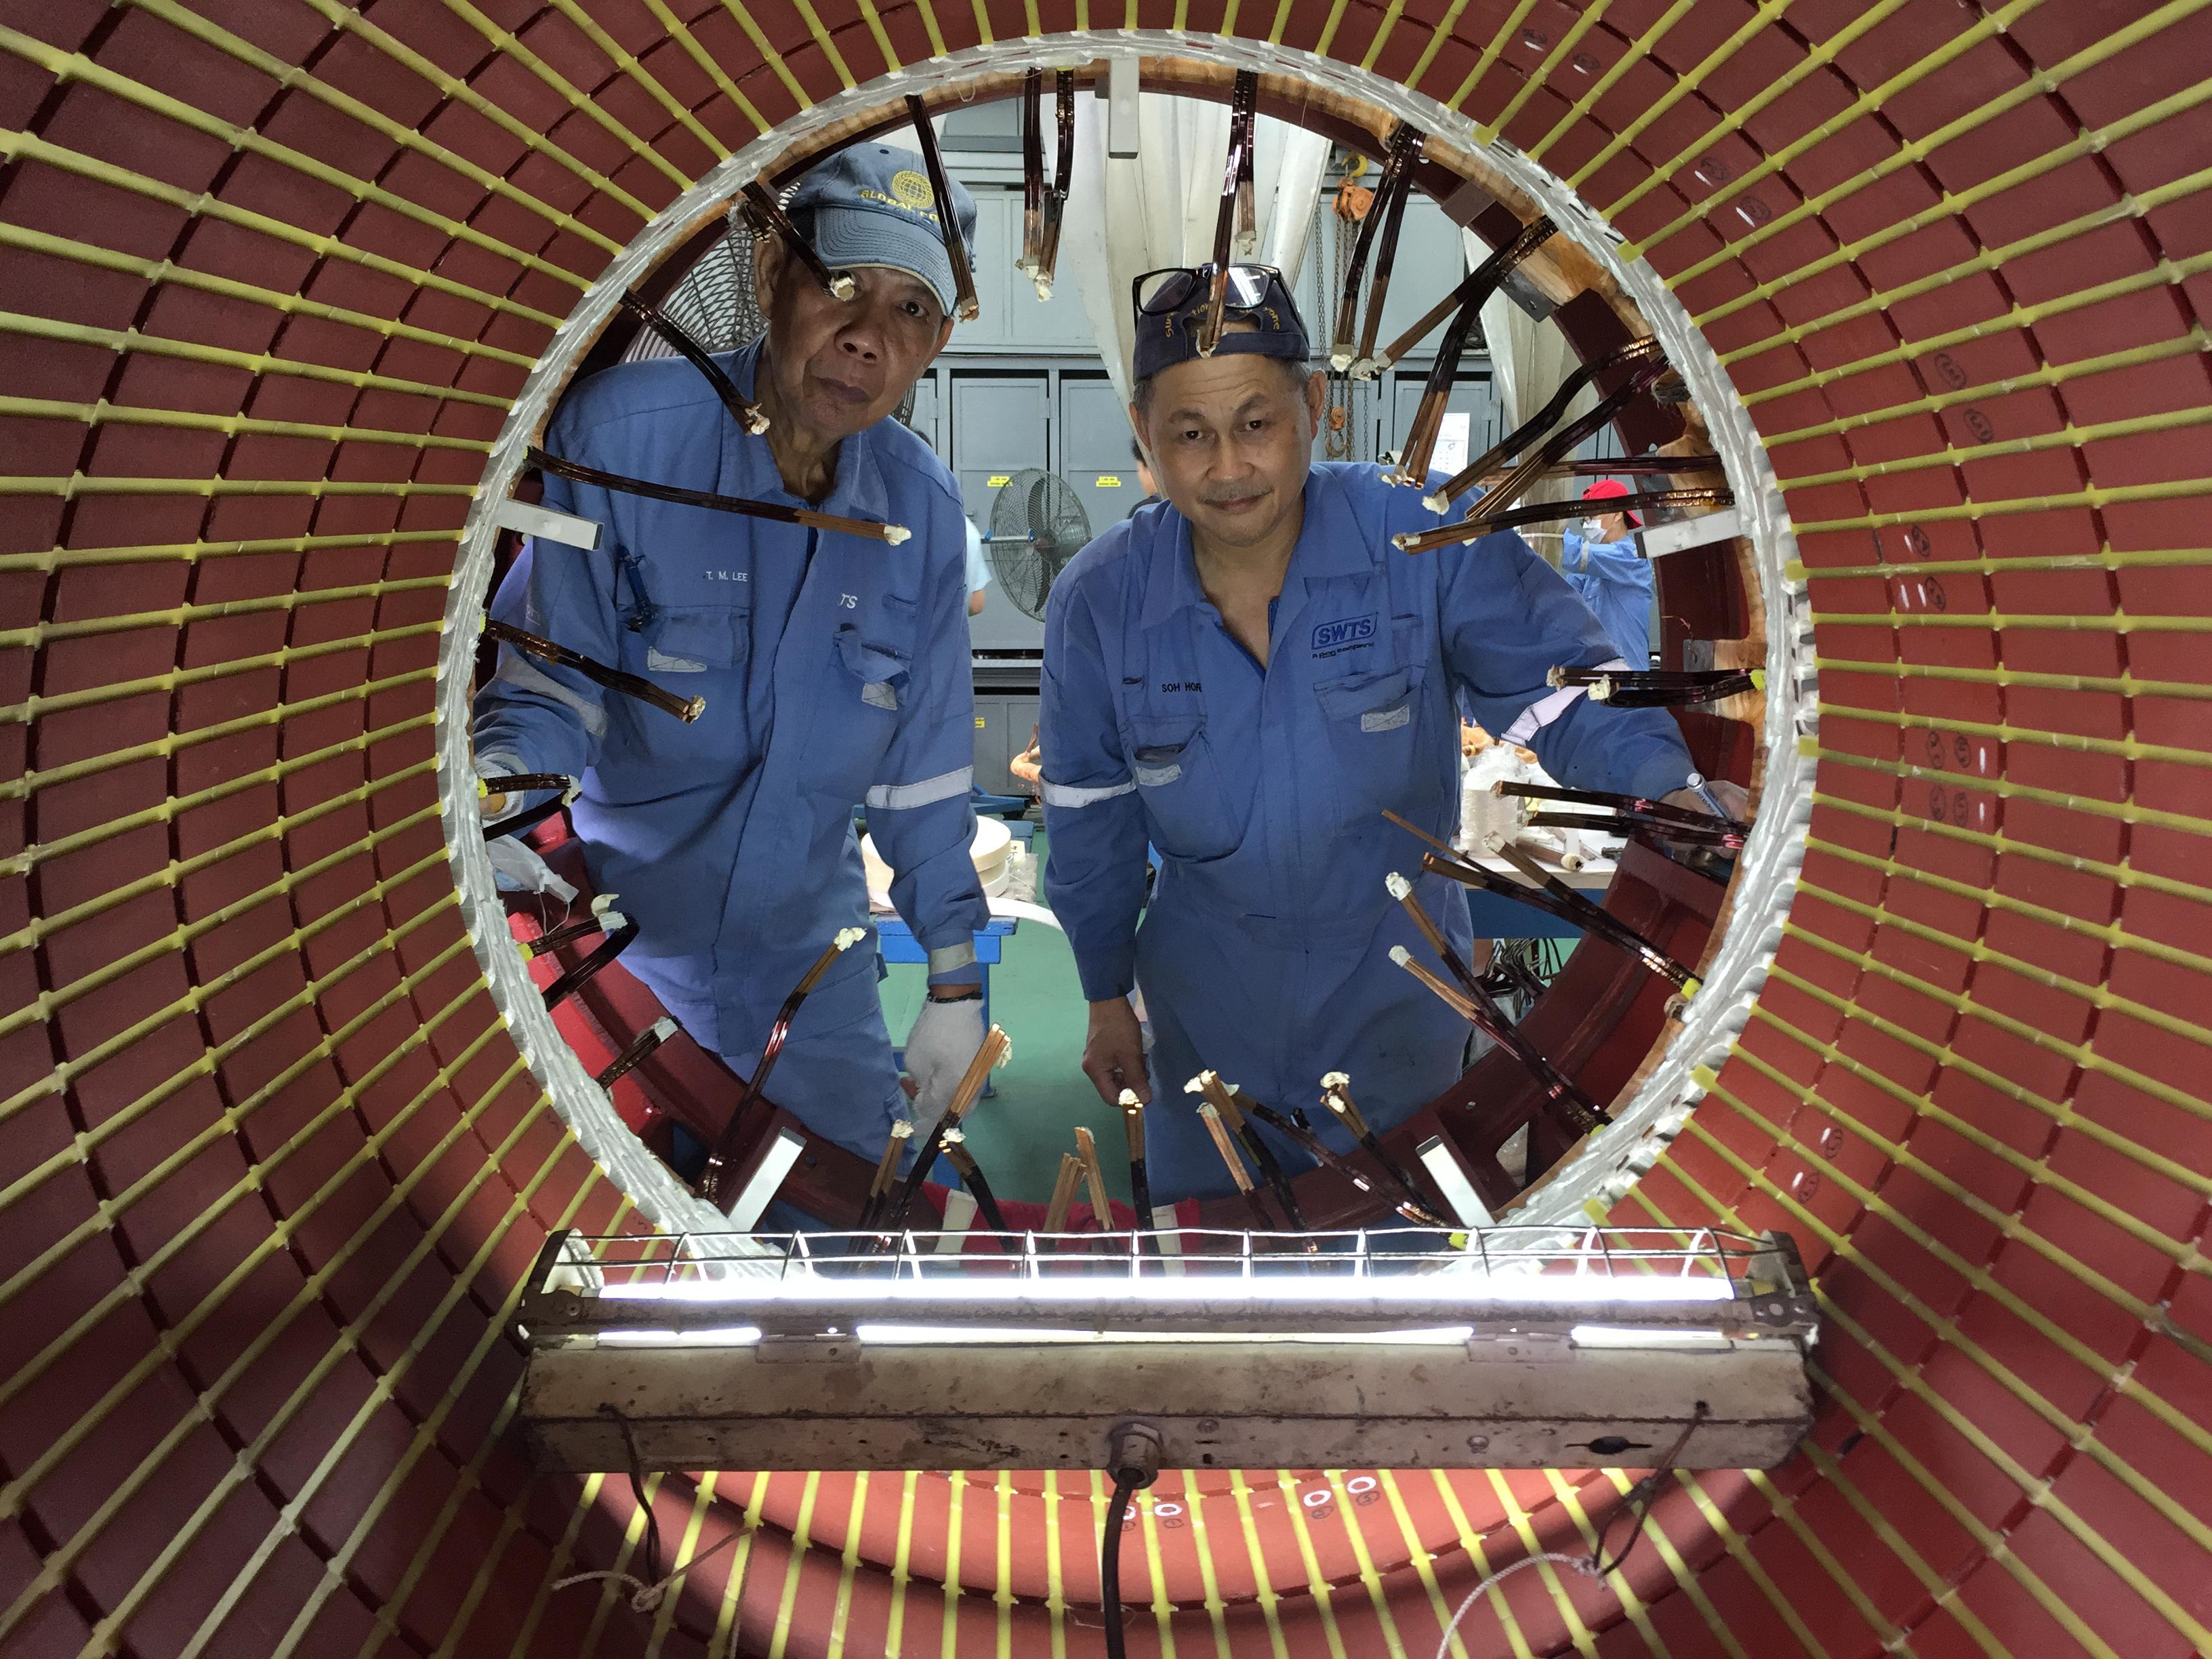 Electrical Motors and Generators MRO Specialists